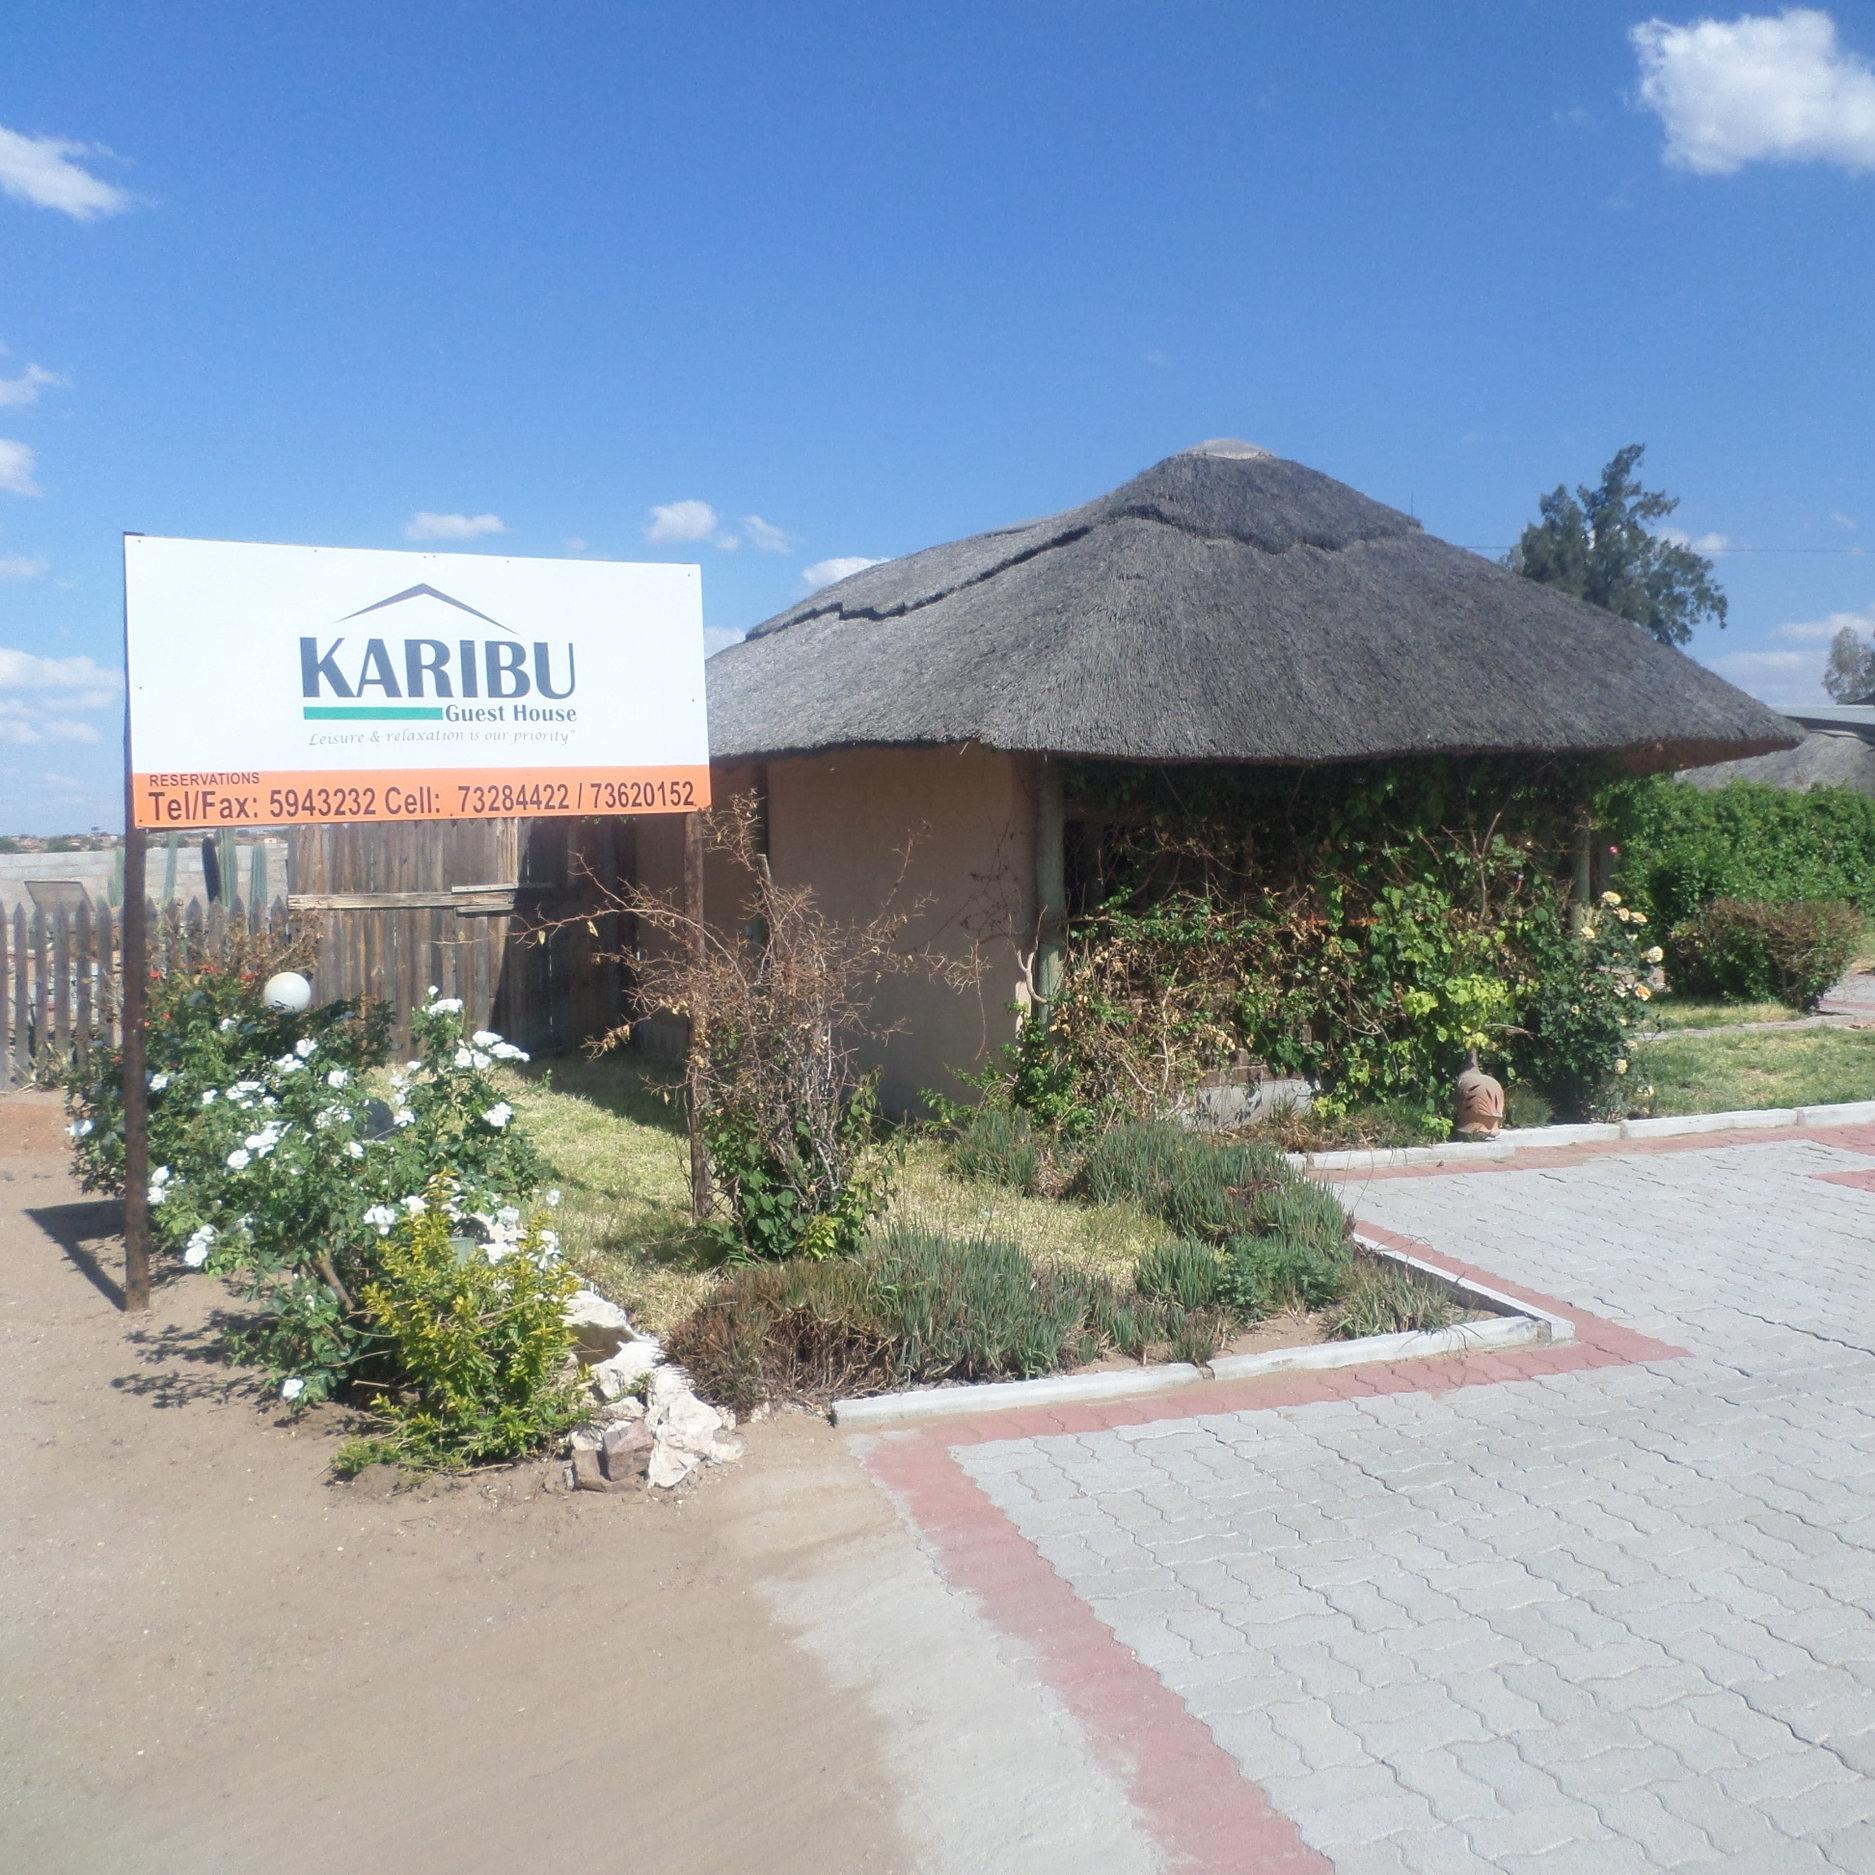 Karibu Lodge - Service Description∙ Opening Hours:Monday - Friday: Saturday: Sunday:Directions:WardContact:📞 (+267) 7x xx xx xx✎